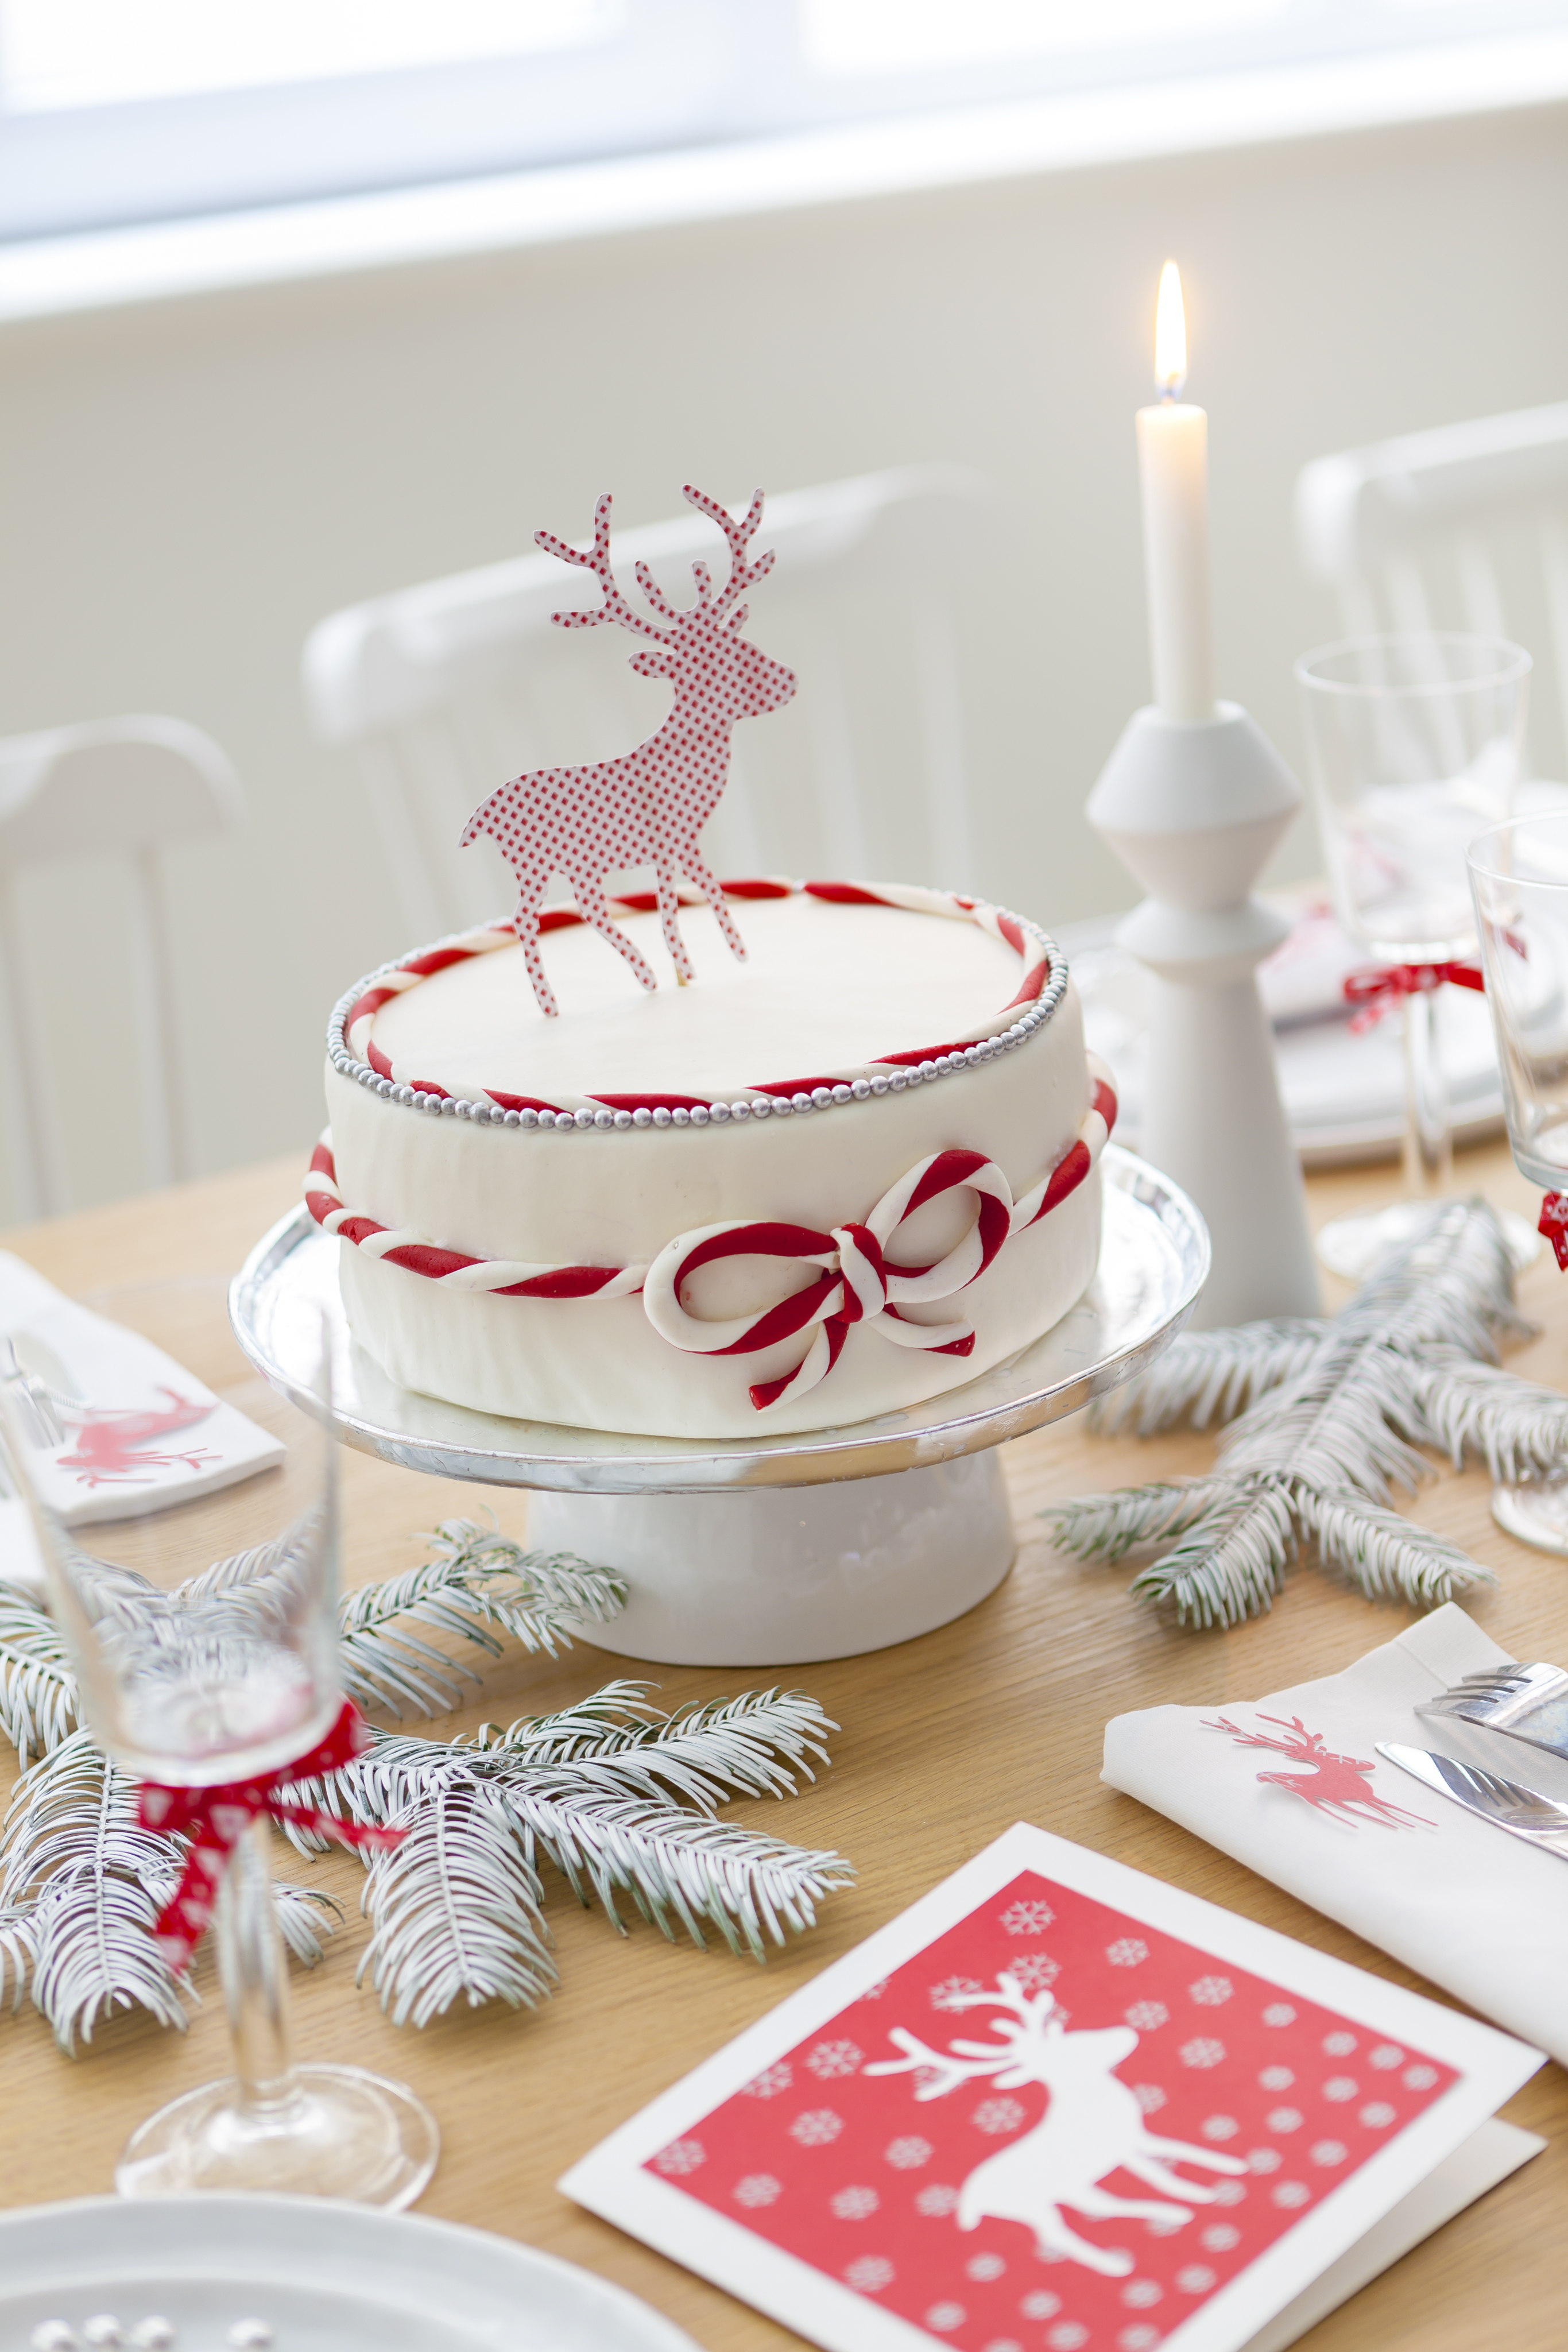 Diy g teau de no l en rouge et blanc go t de food for Decoration gateau noel